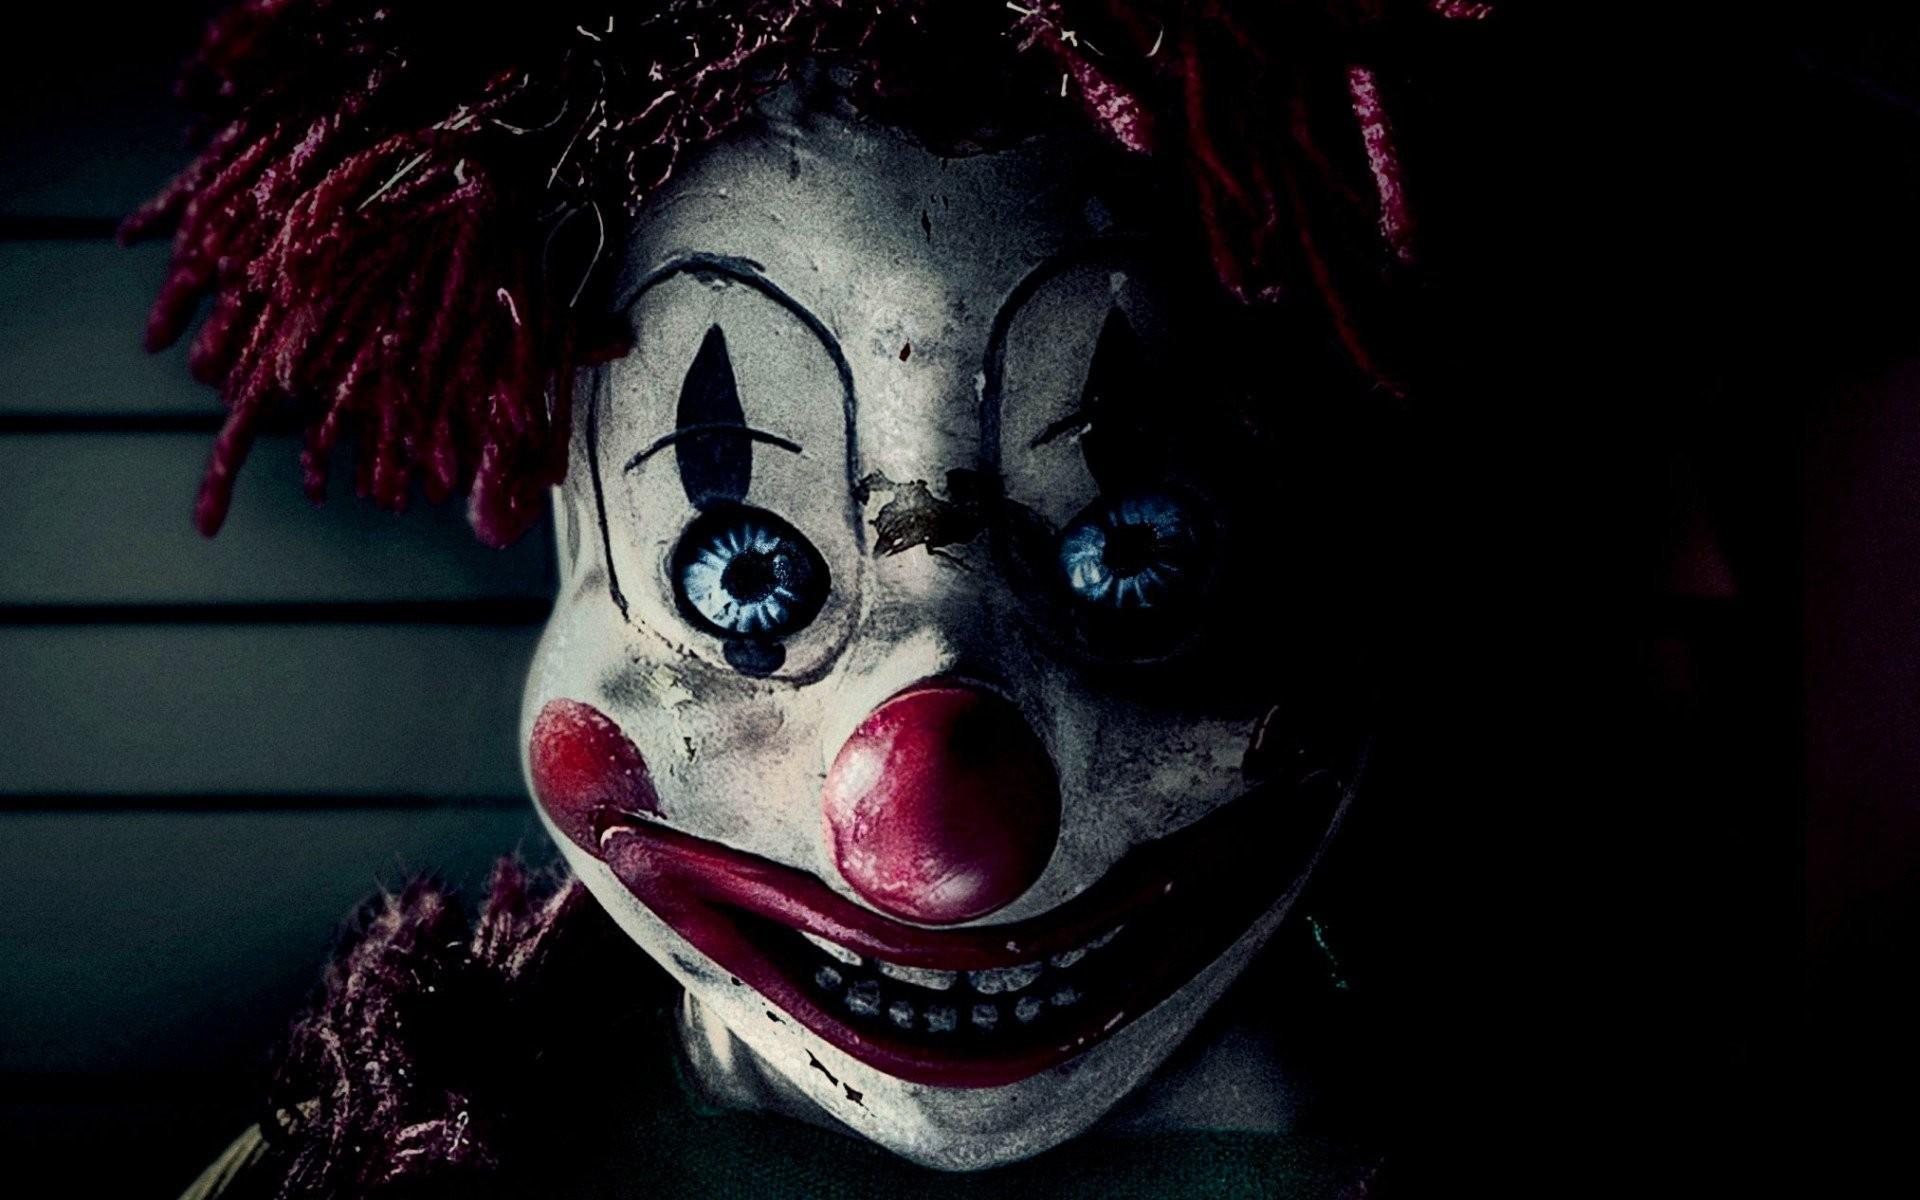 Poltergeist 2015 wallpaper, clown, eyes, smile, HD background